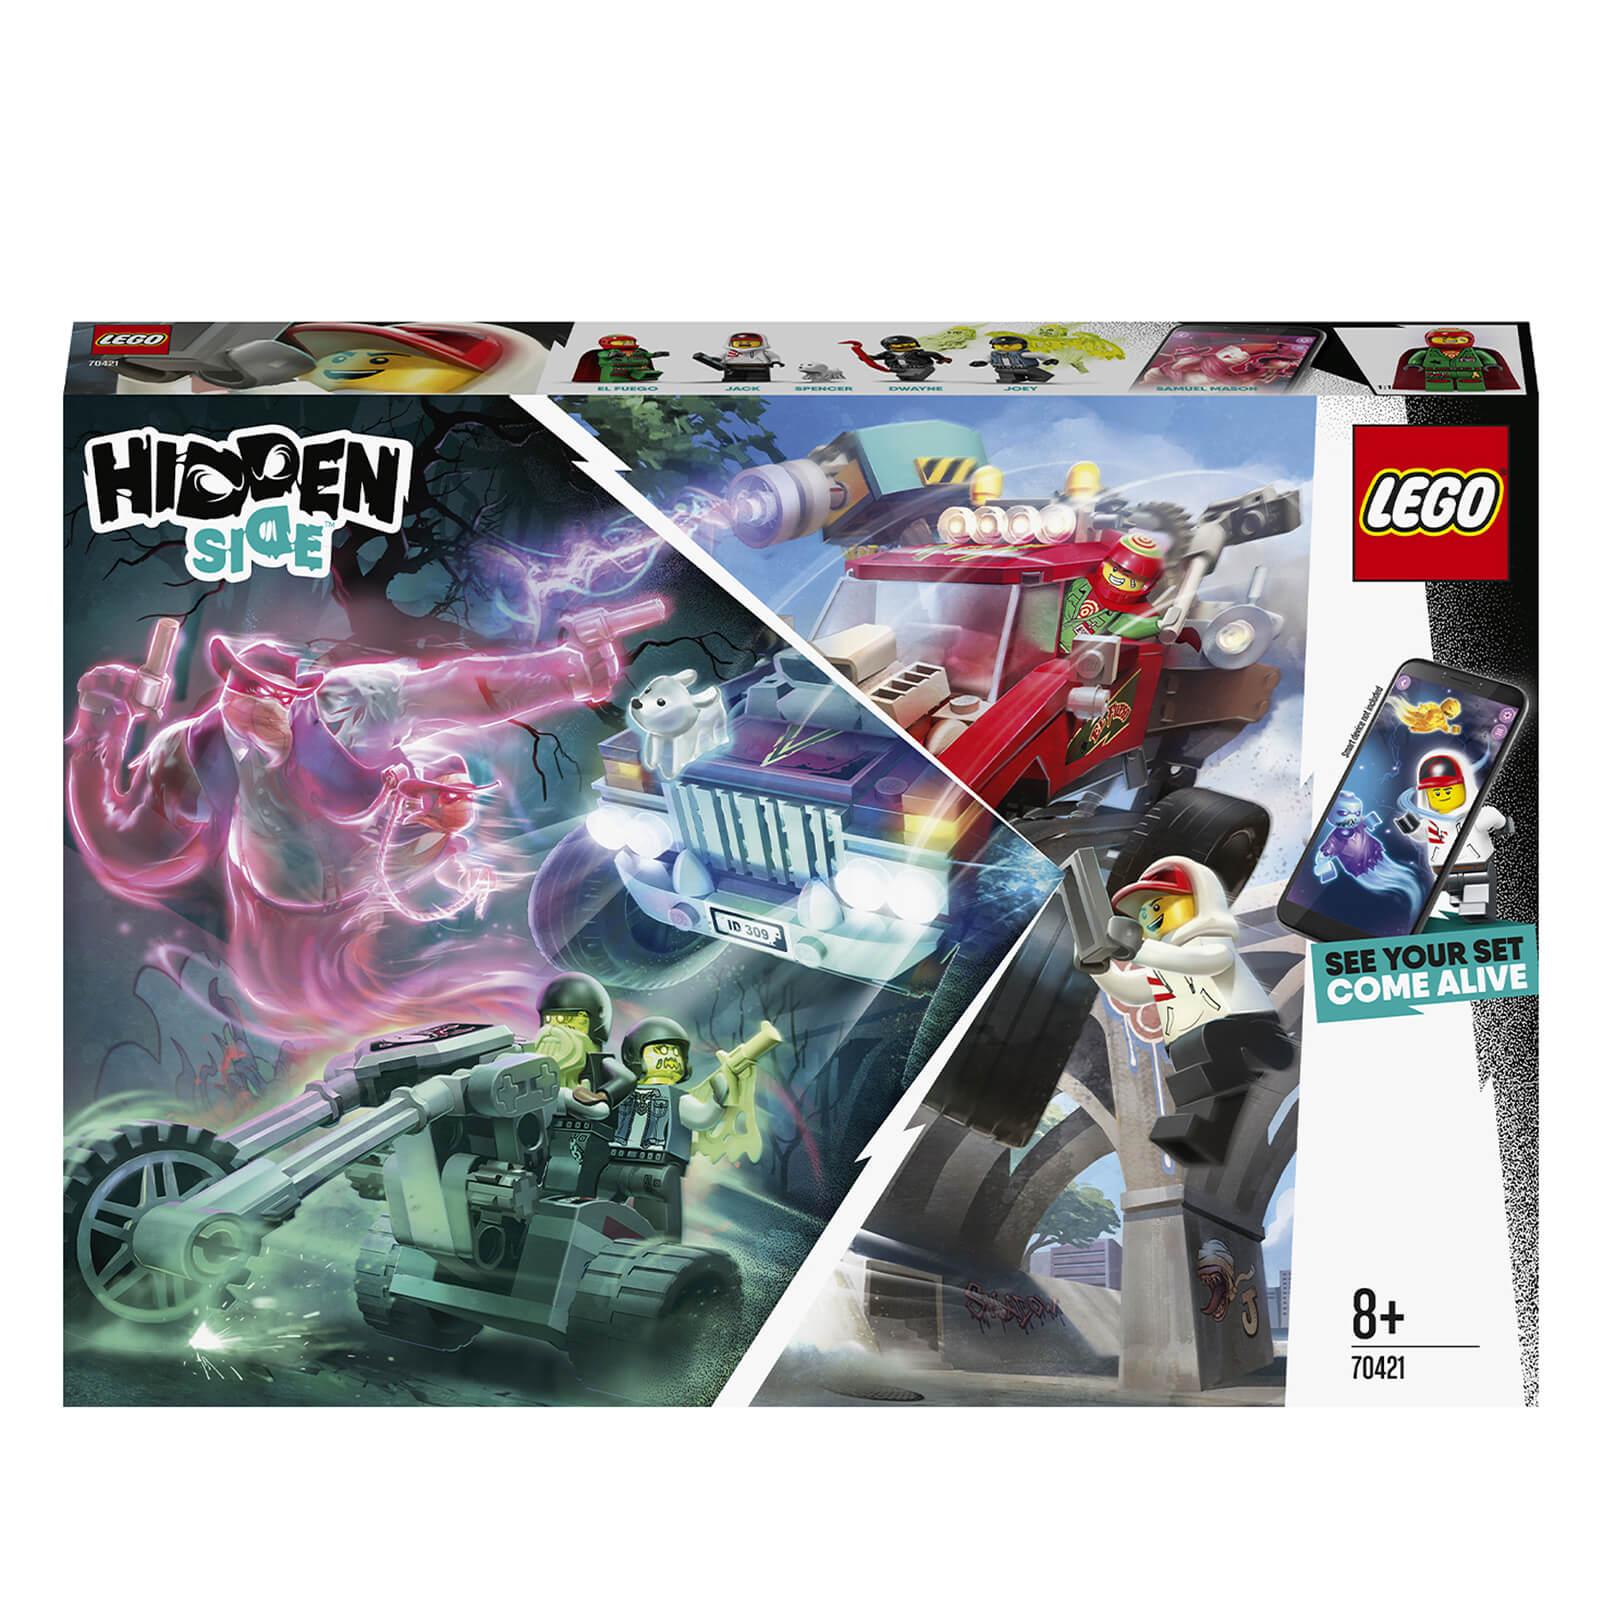 LEGO Hidden Side: El Fuego�s Stunt Truck AR Games Set (70421)